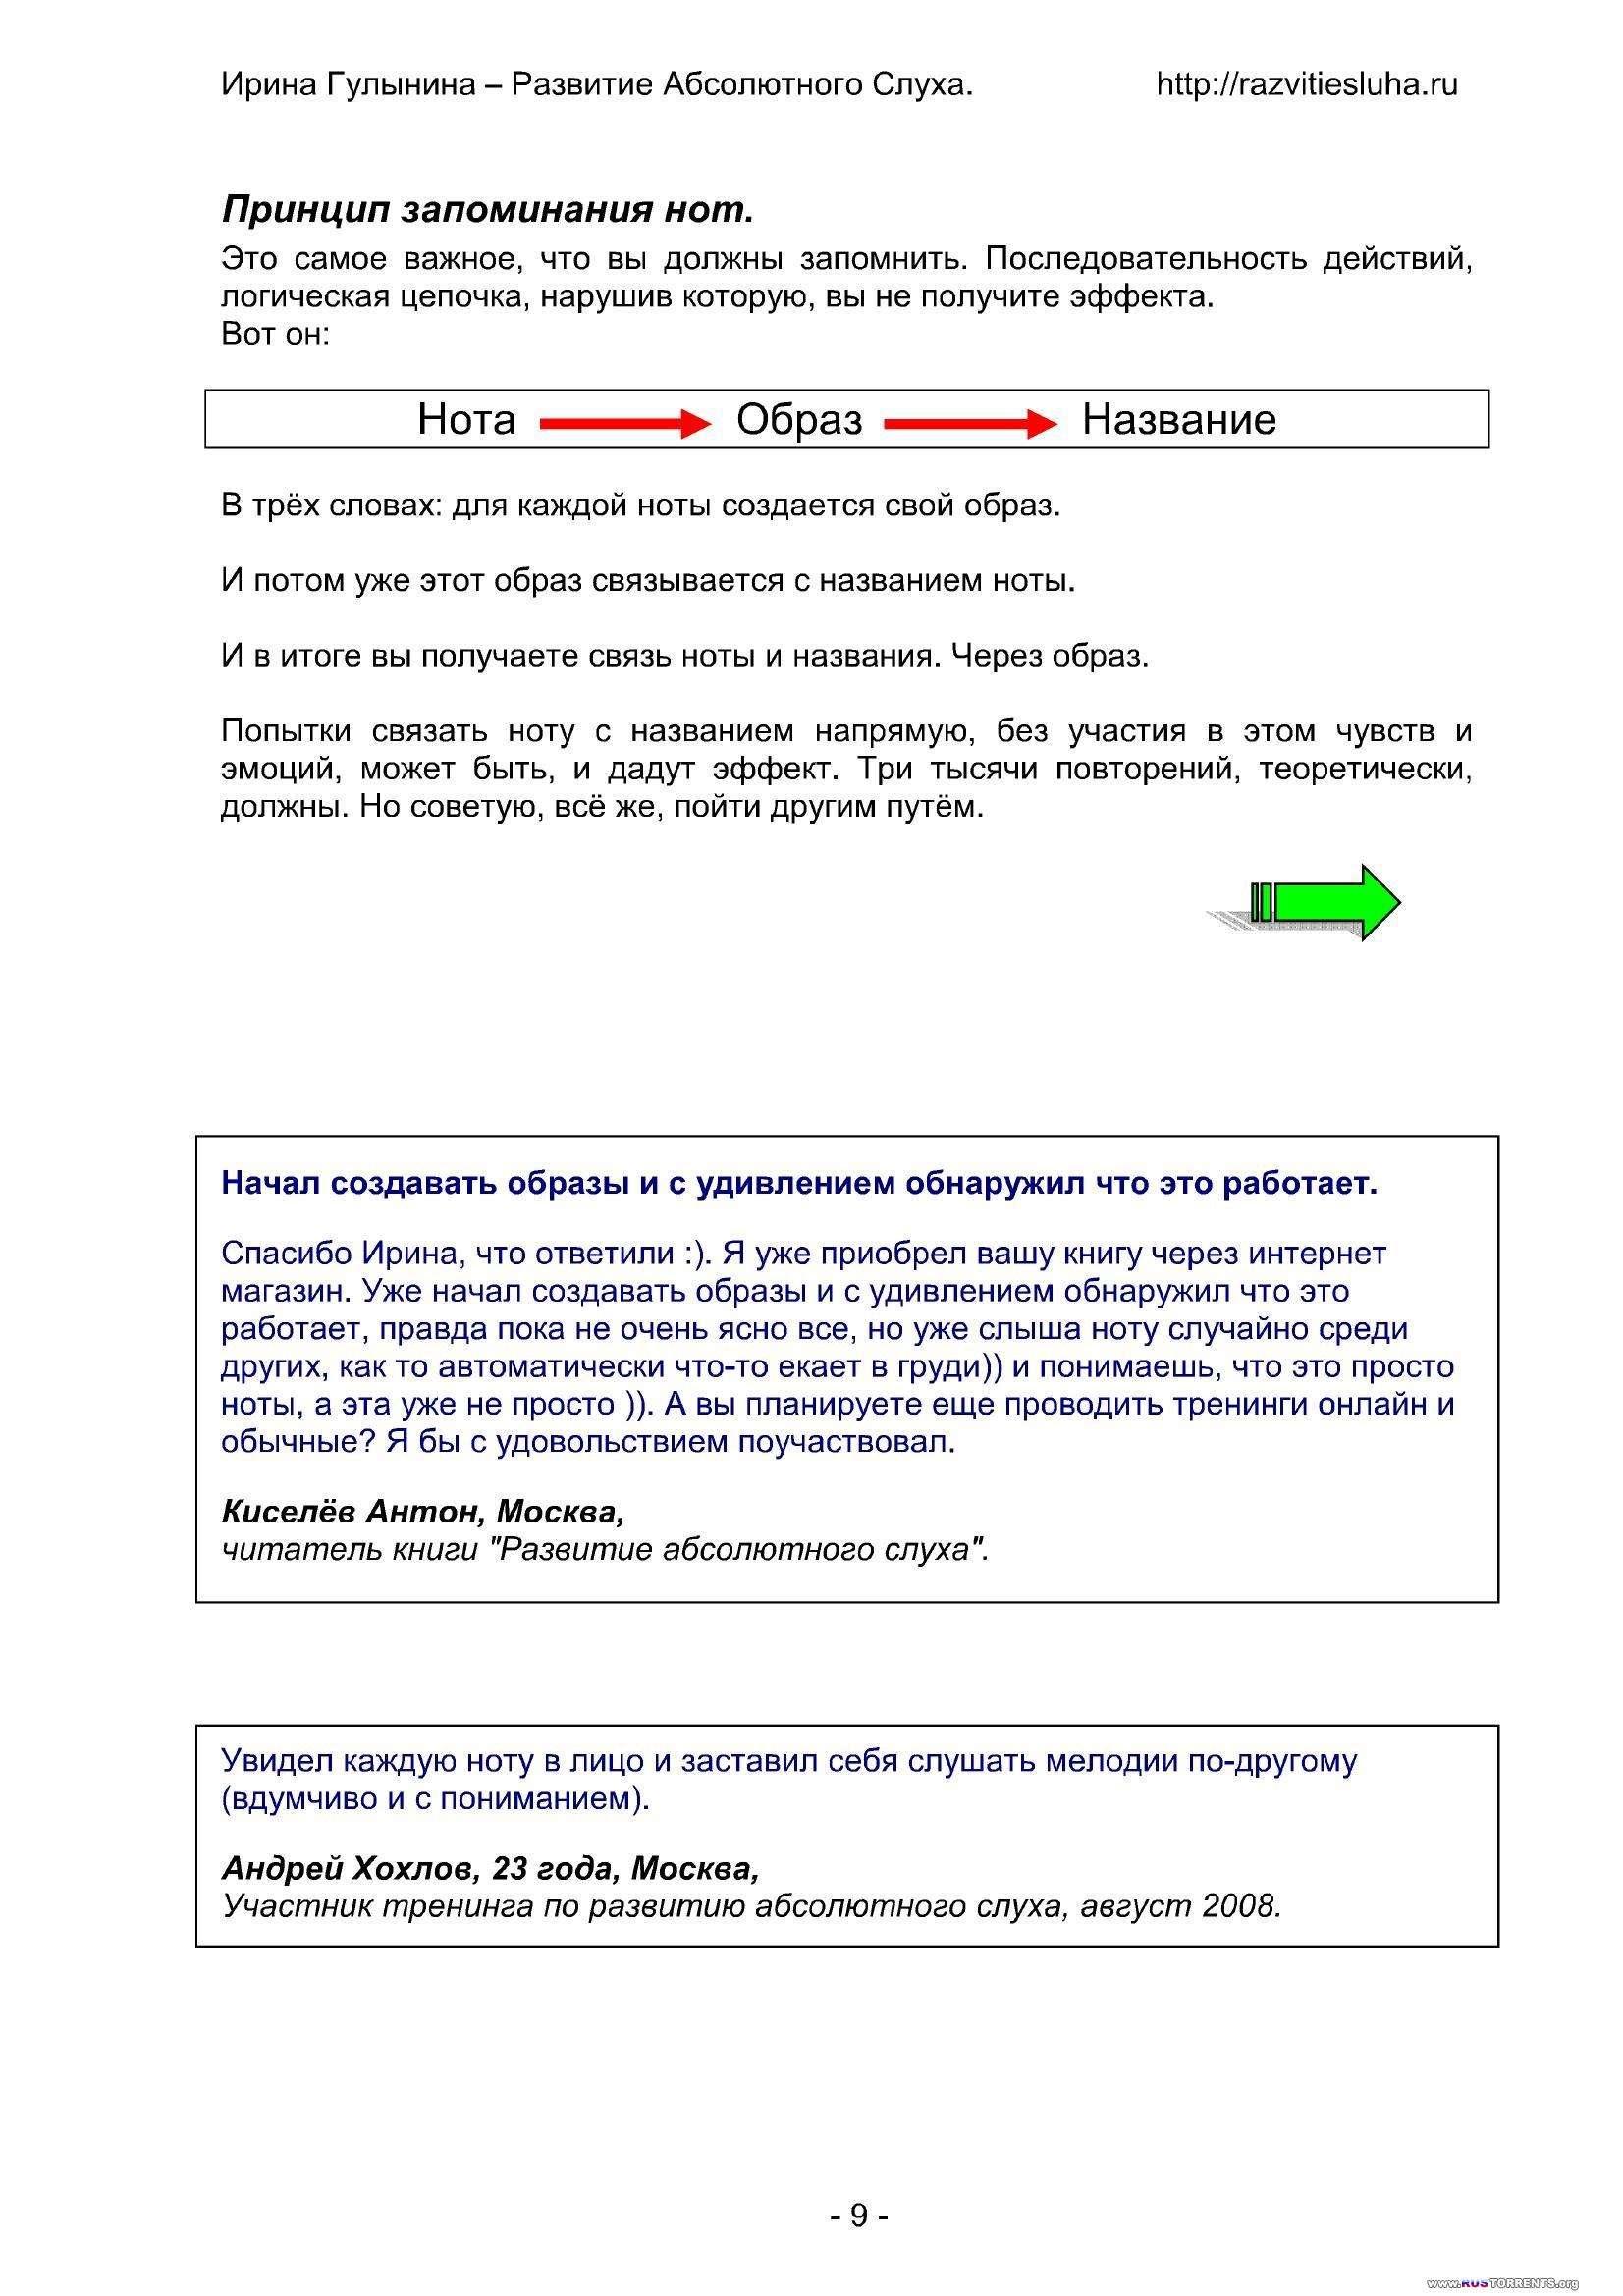 Развитие абсолютного слуха | PDF